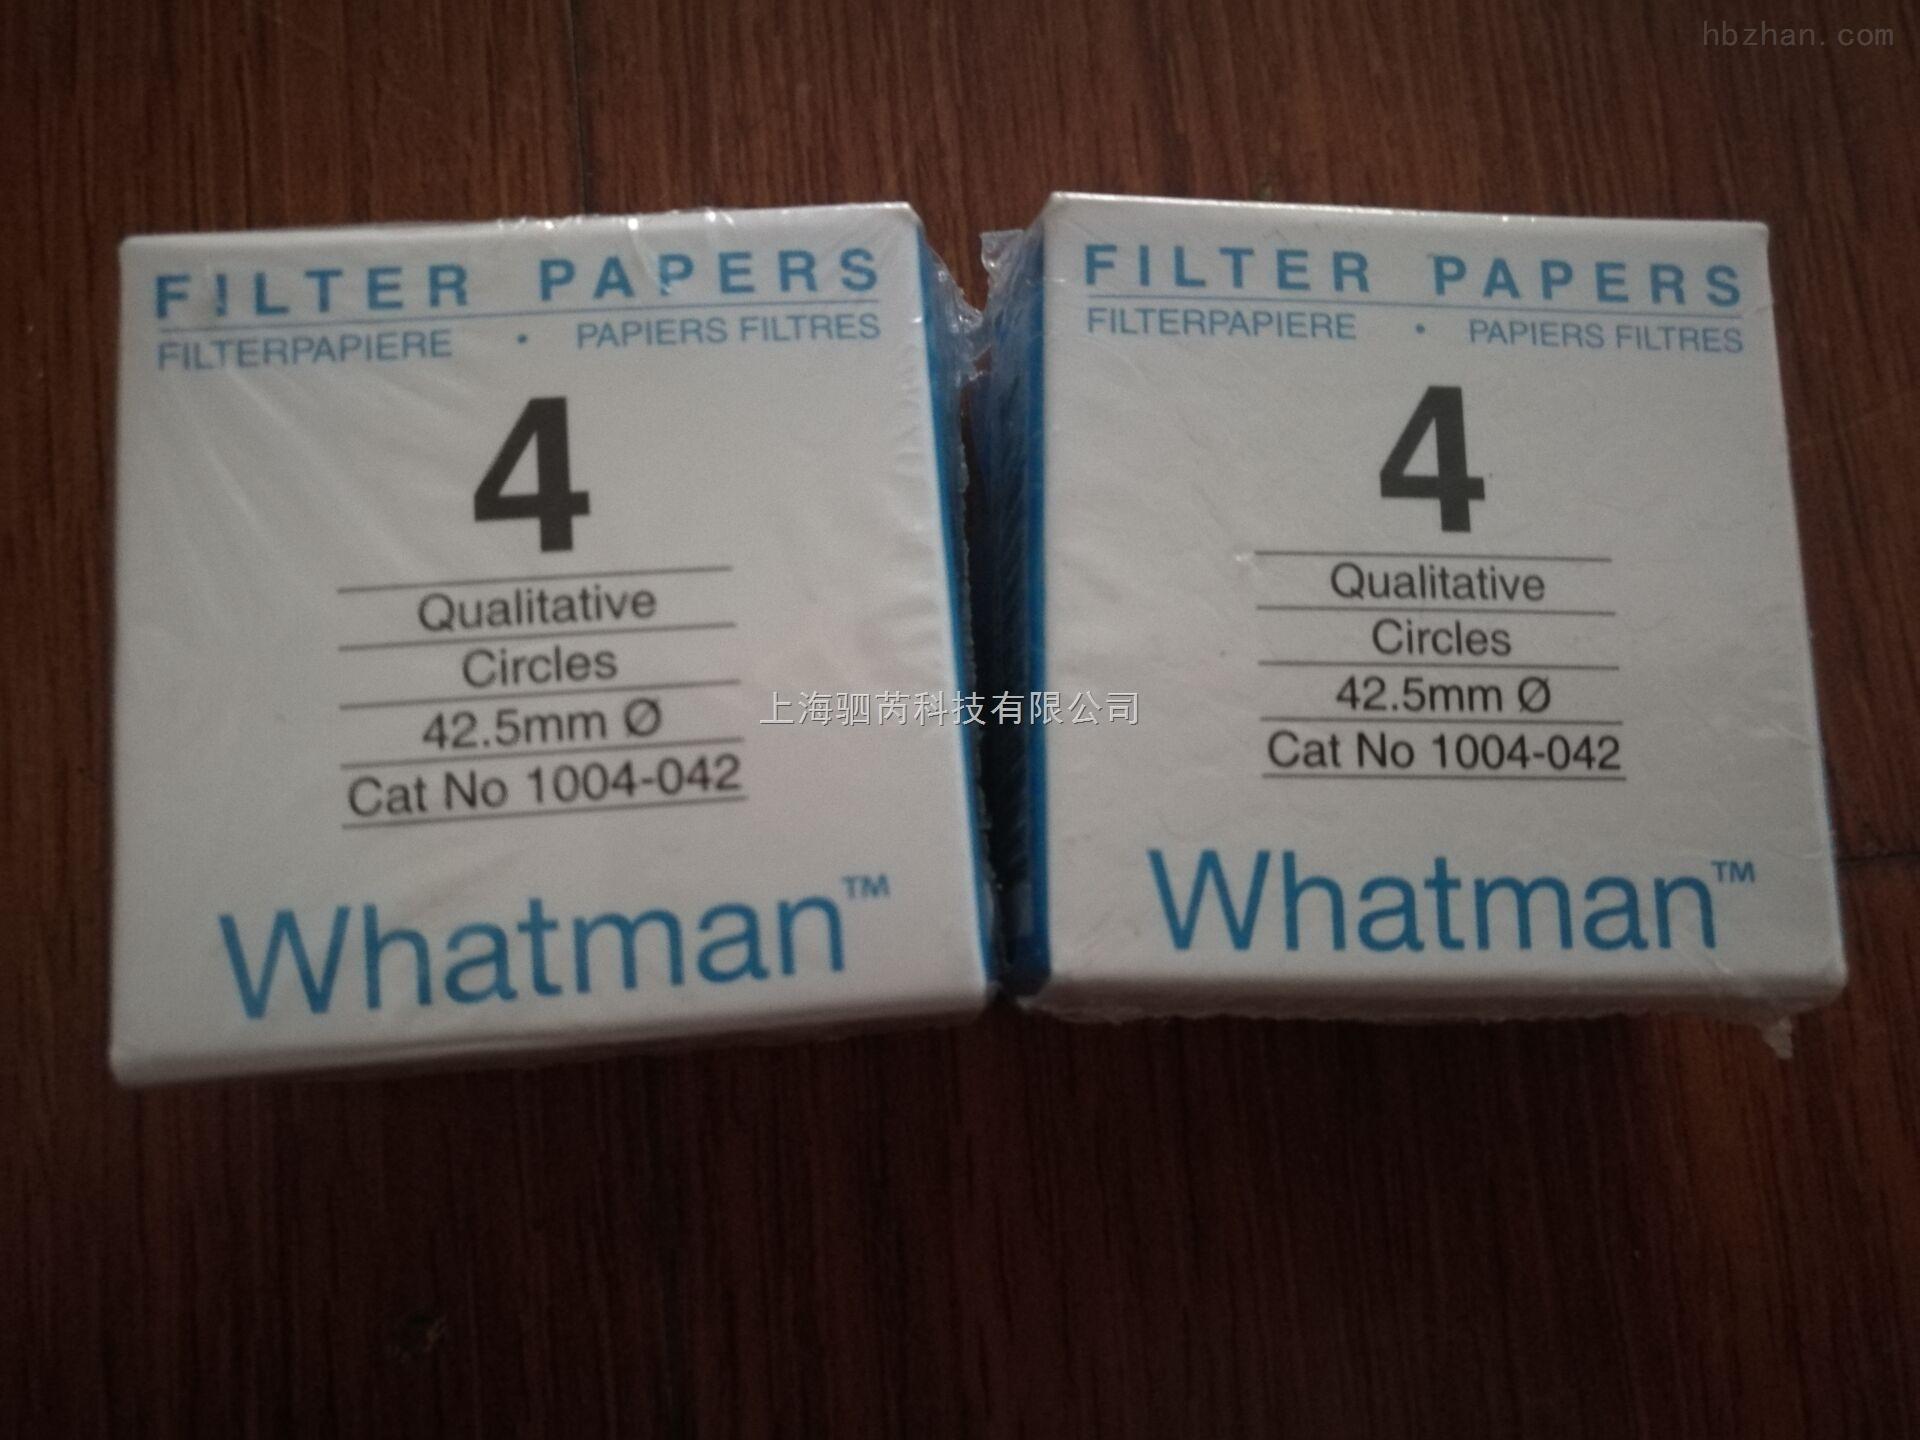 WHATMAN whatman定性快速滤纸4号滤纸1004-042